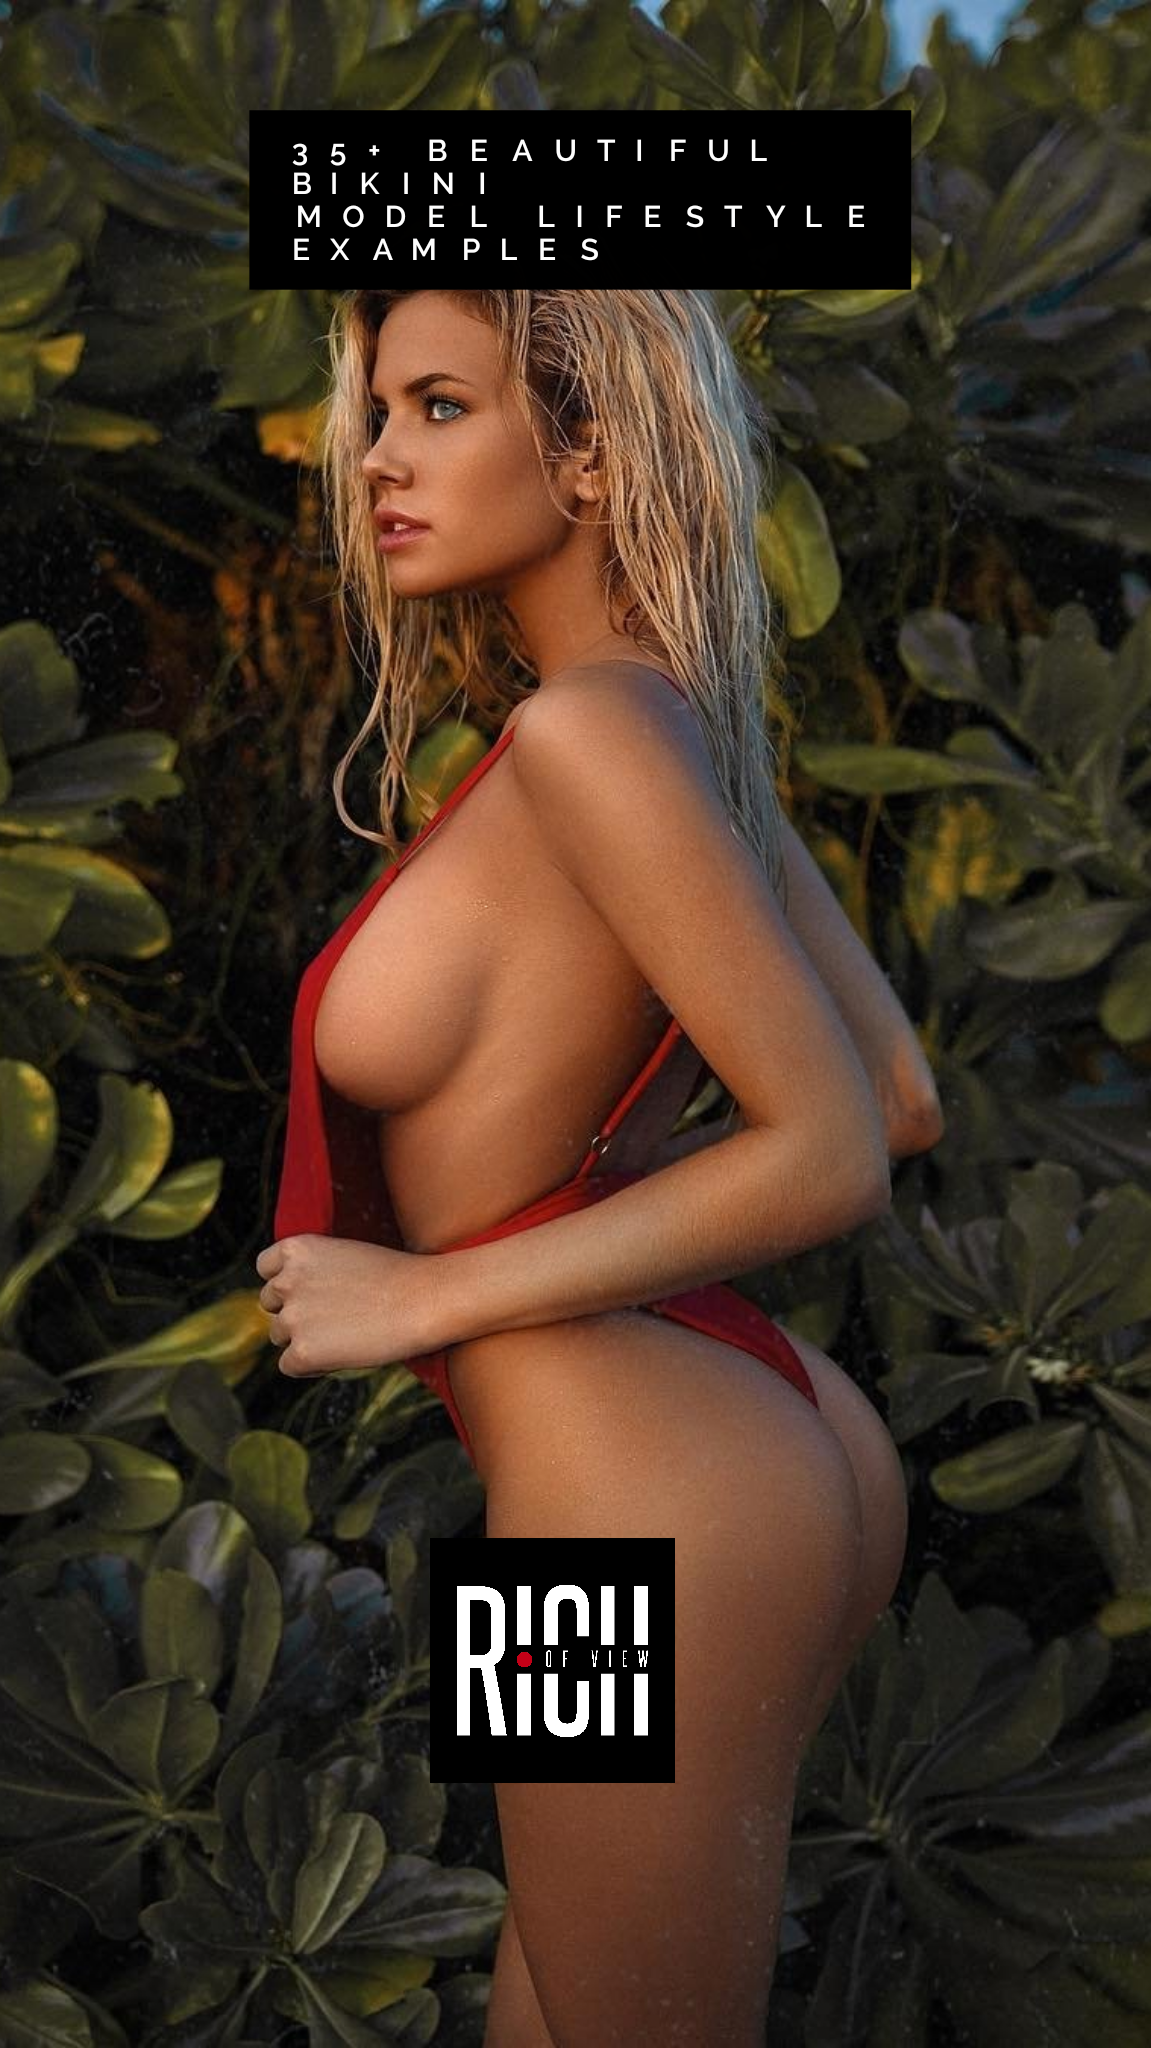 Télécharger photo bikini model png